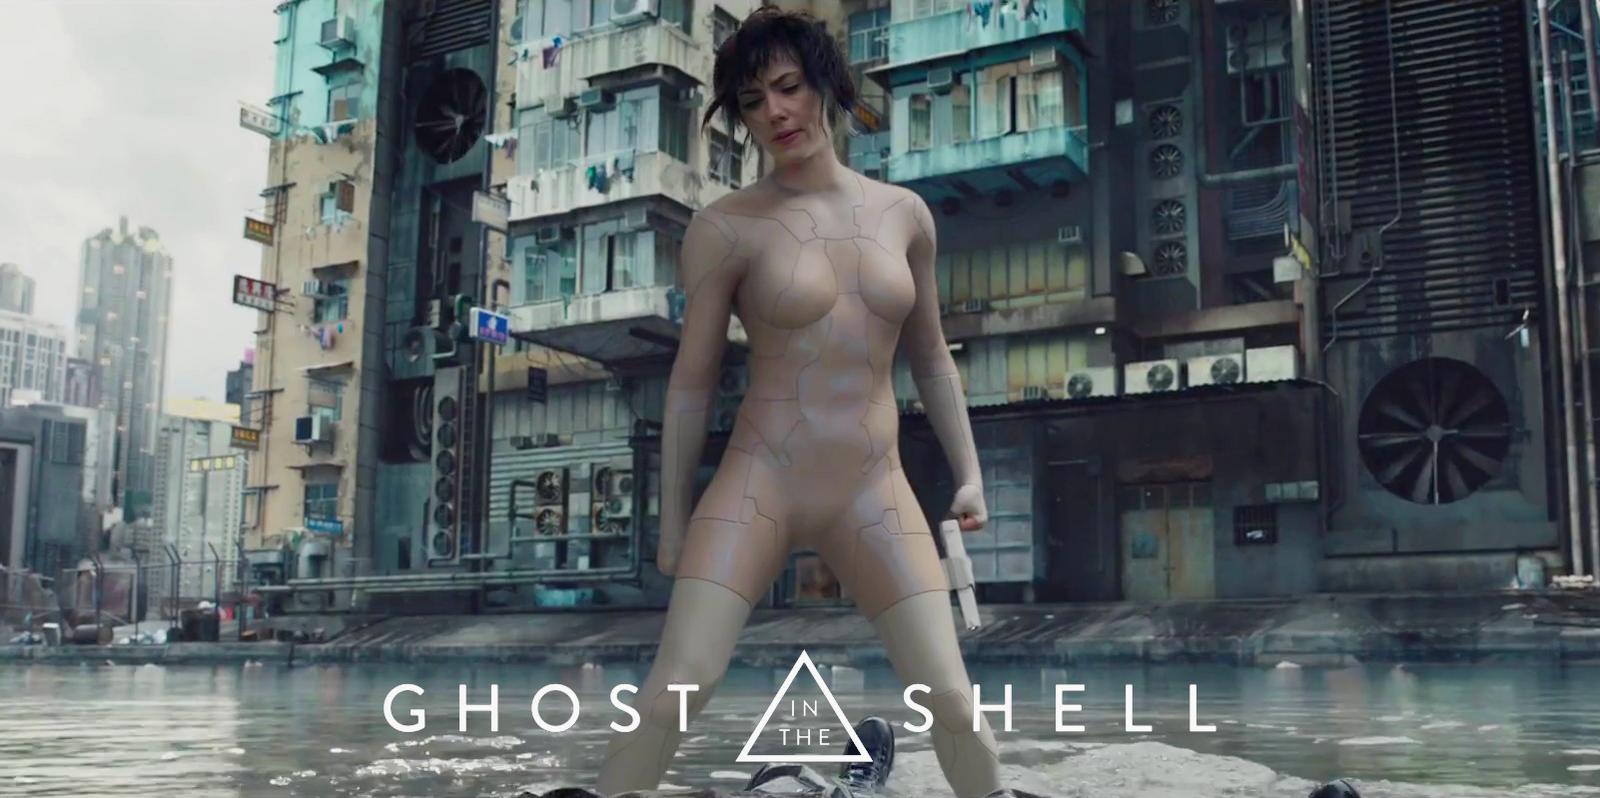 Wallpaper Ghost In The Shell Scarlett Johansson Cyberpunk City Bodysuit Brunette Cyborg Kusanagi Motoko 1600x798 Wall1223 1368911 Hd Wallpapers Wallhere